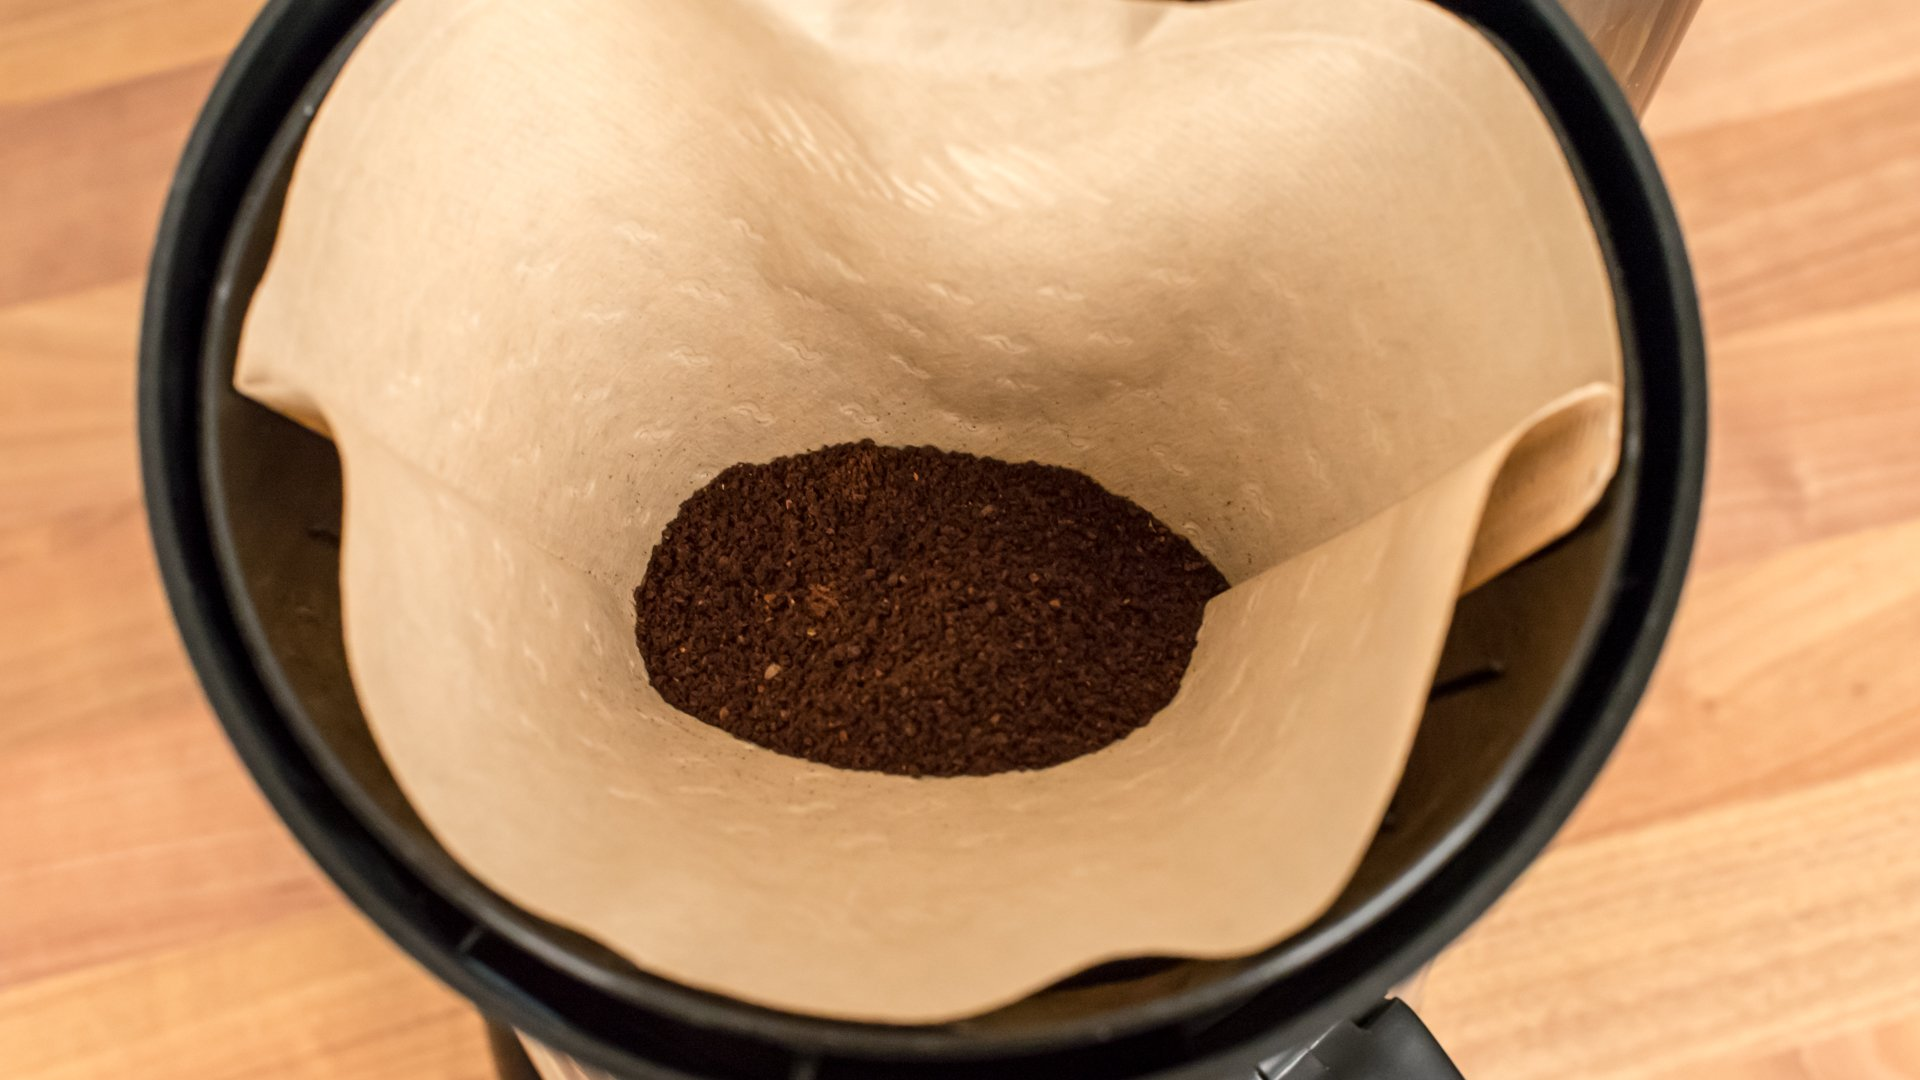 Swan Coffee Maker Replacement Jug : Swan 1.25L Coffee Maker review Expert Reviews